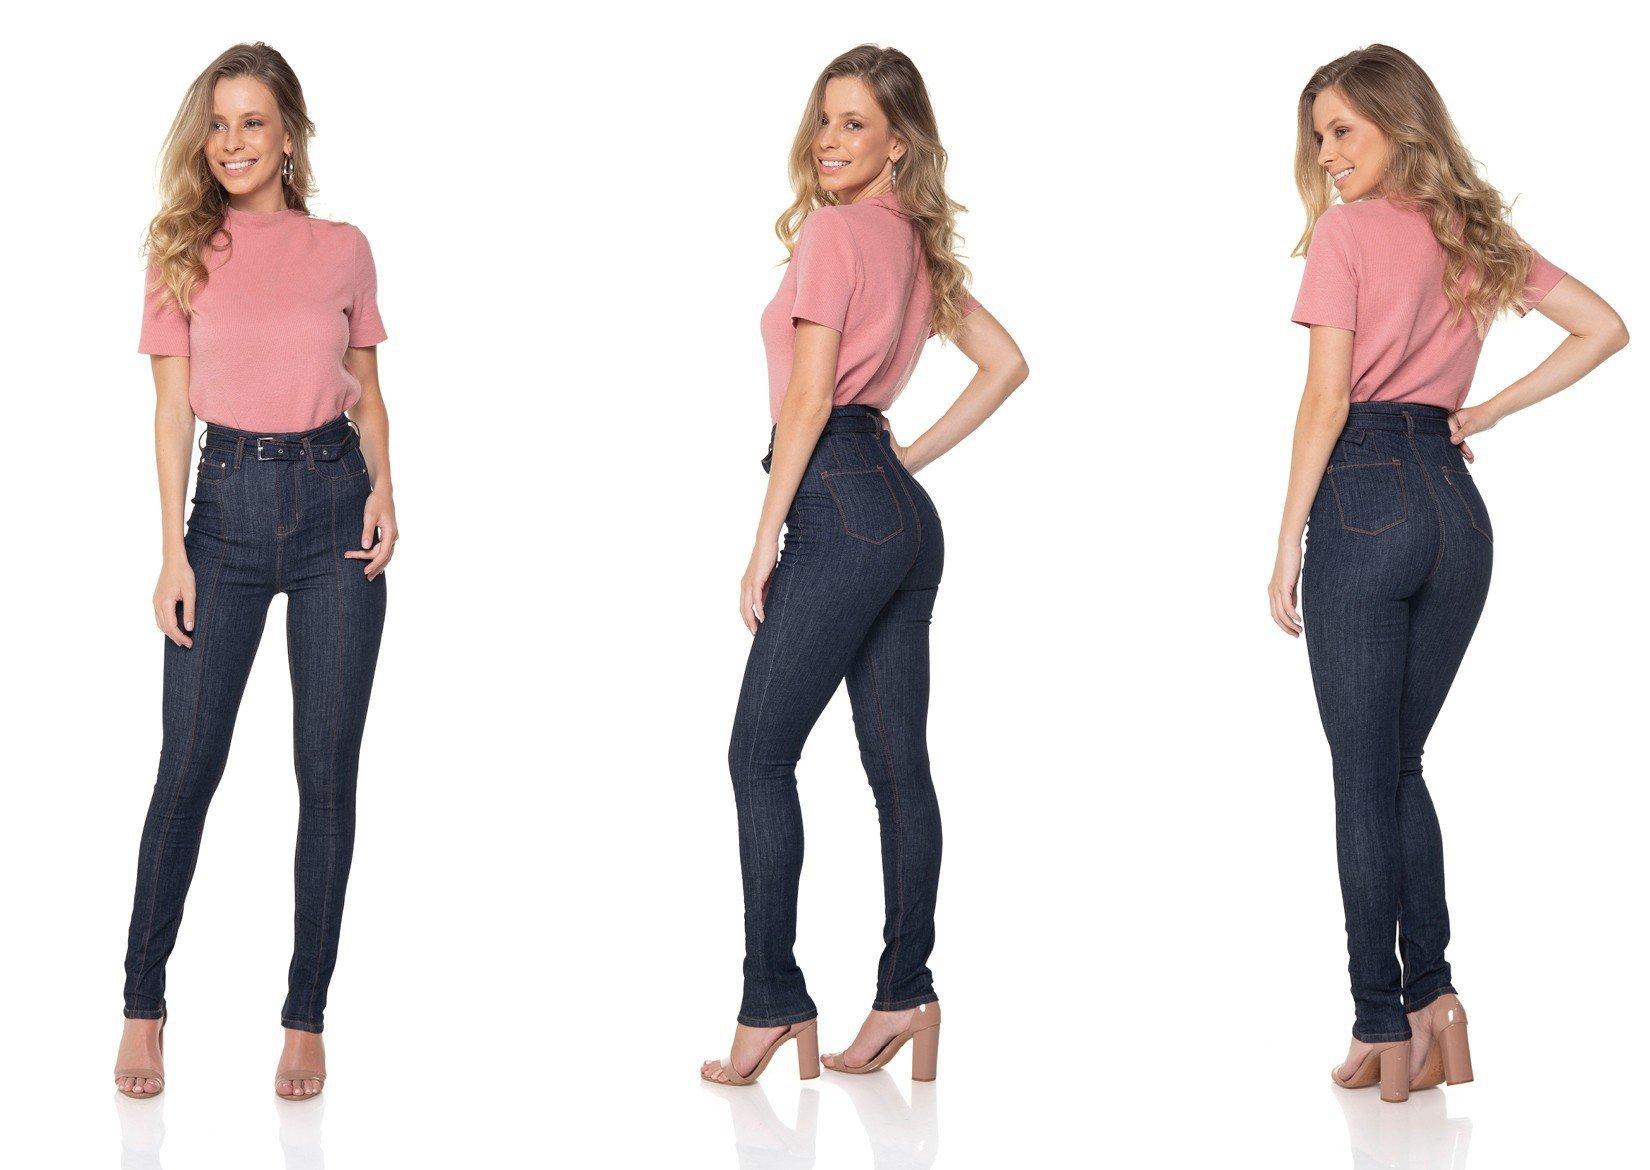 dz2843 calca jeans skinny hot pants cinto de jeans denim zero tripla